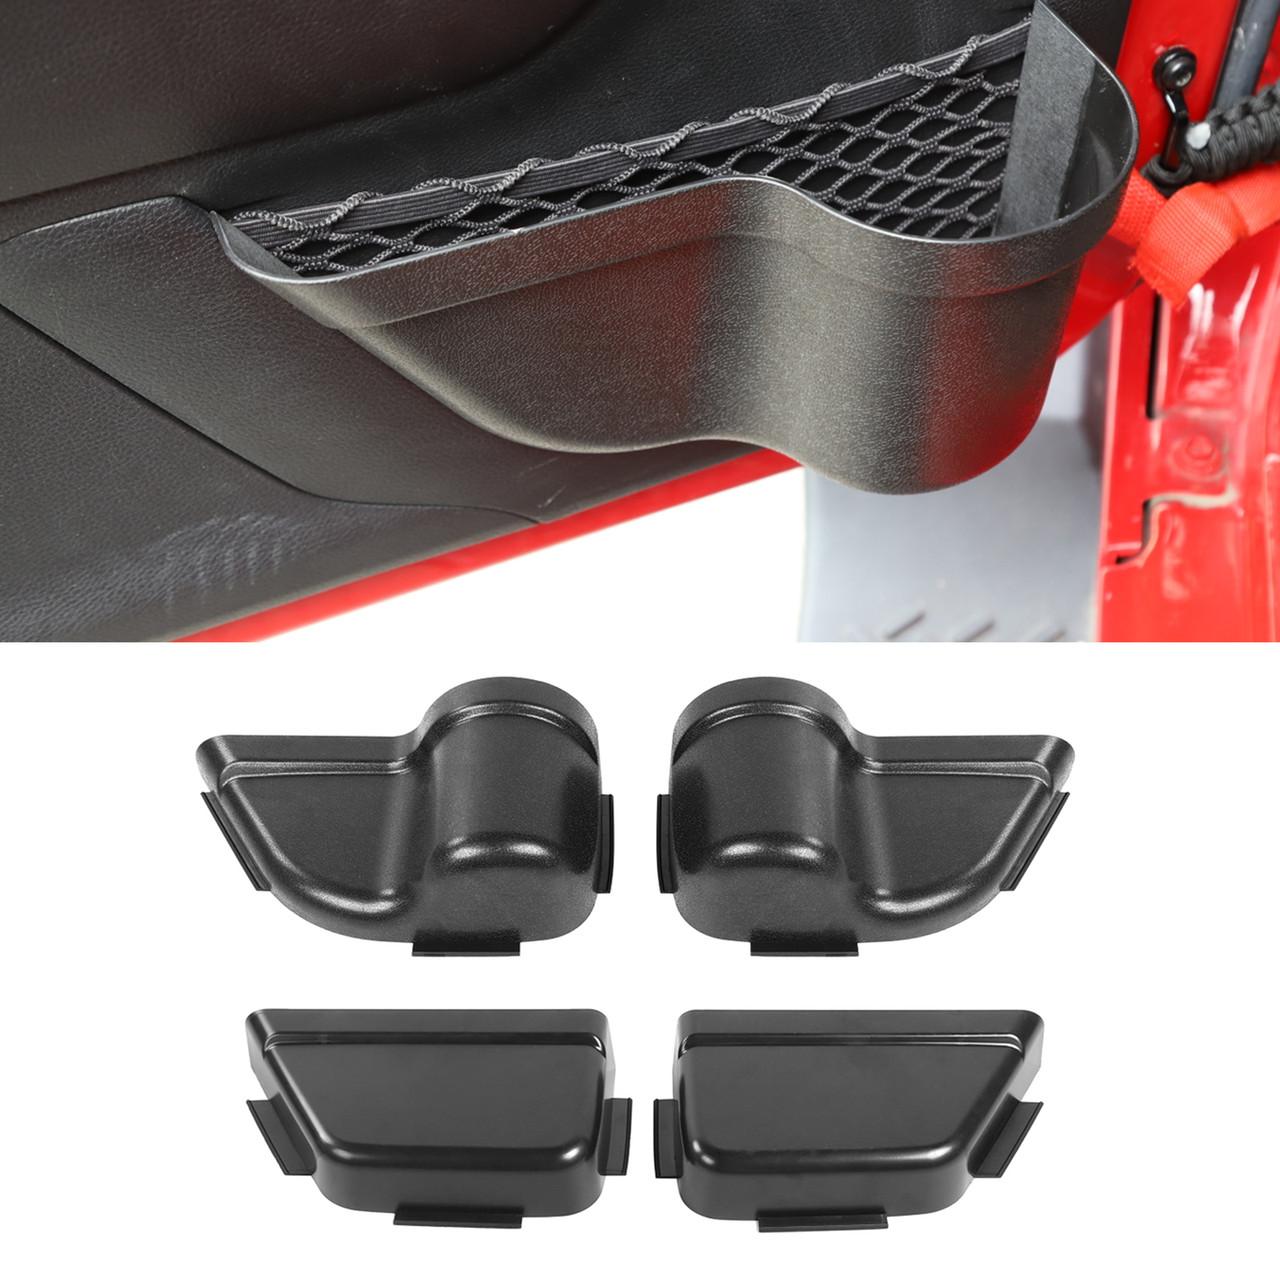 ABS Plastic 4Pcs 4-Door Net Pocket Storage Box For Jeep Wrangler JK 11-17 Parts